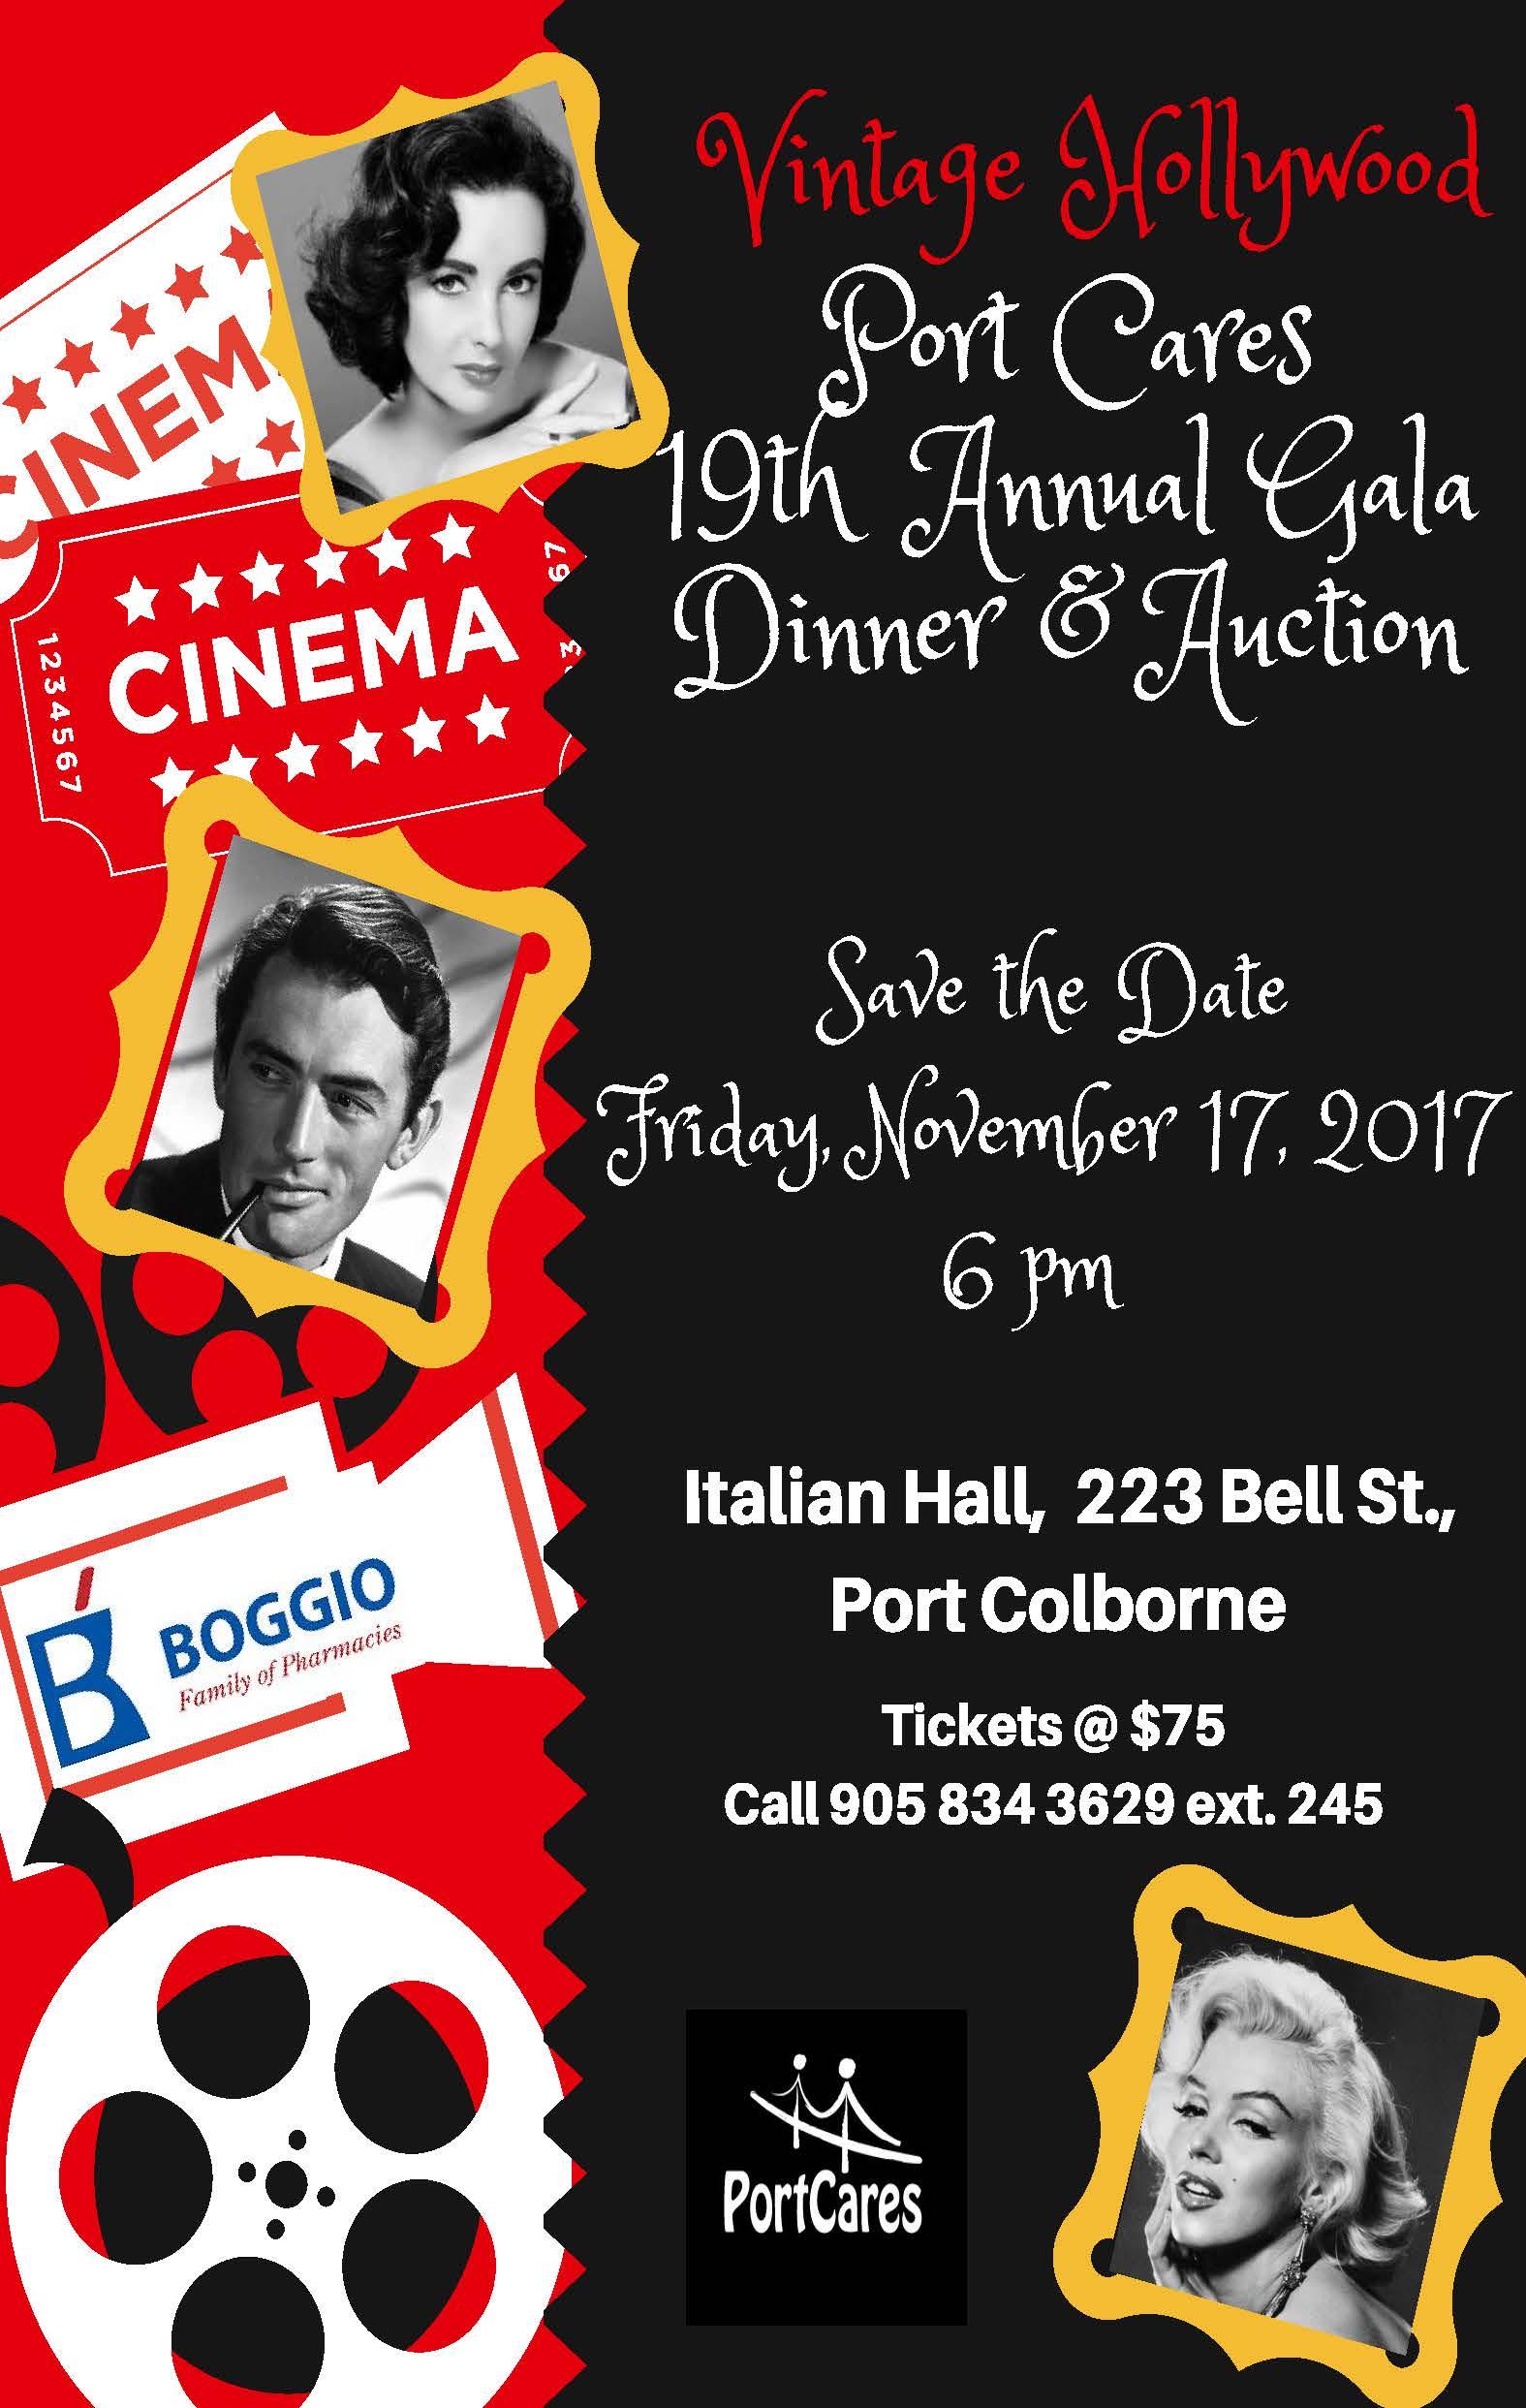 Port Cares Gala Dinner & Auction